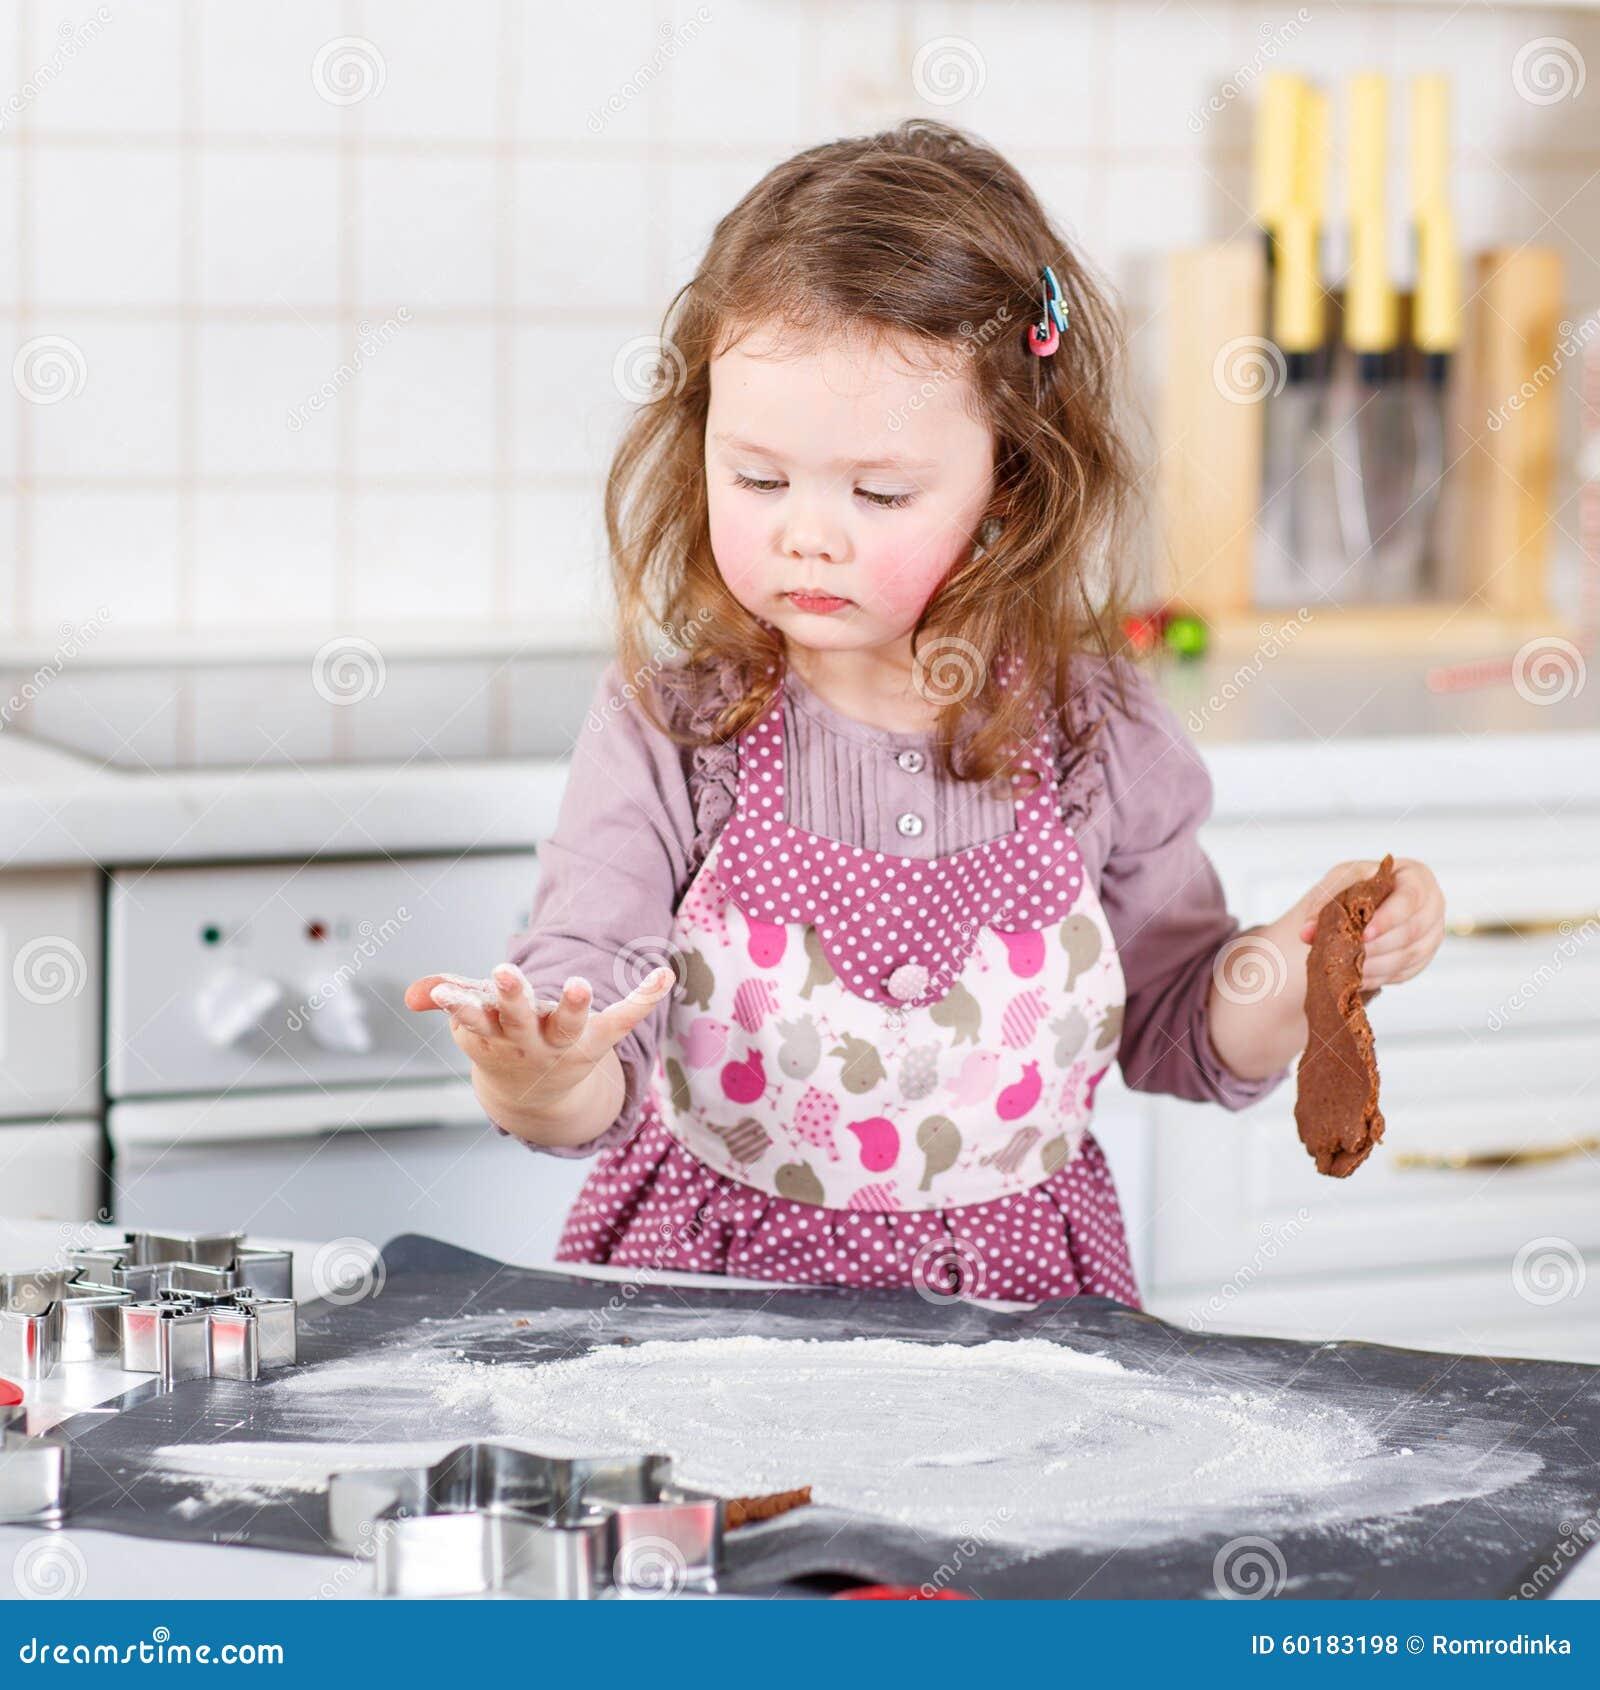 Happy Girl Kitchen: Happy Child Enjoying Baking At Home Royalty-Free Stock